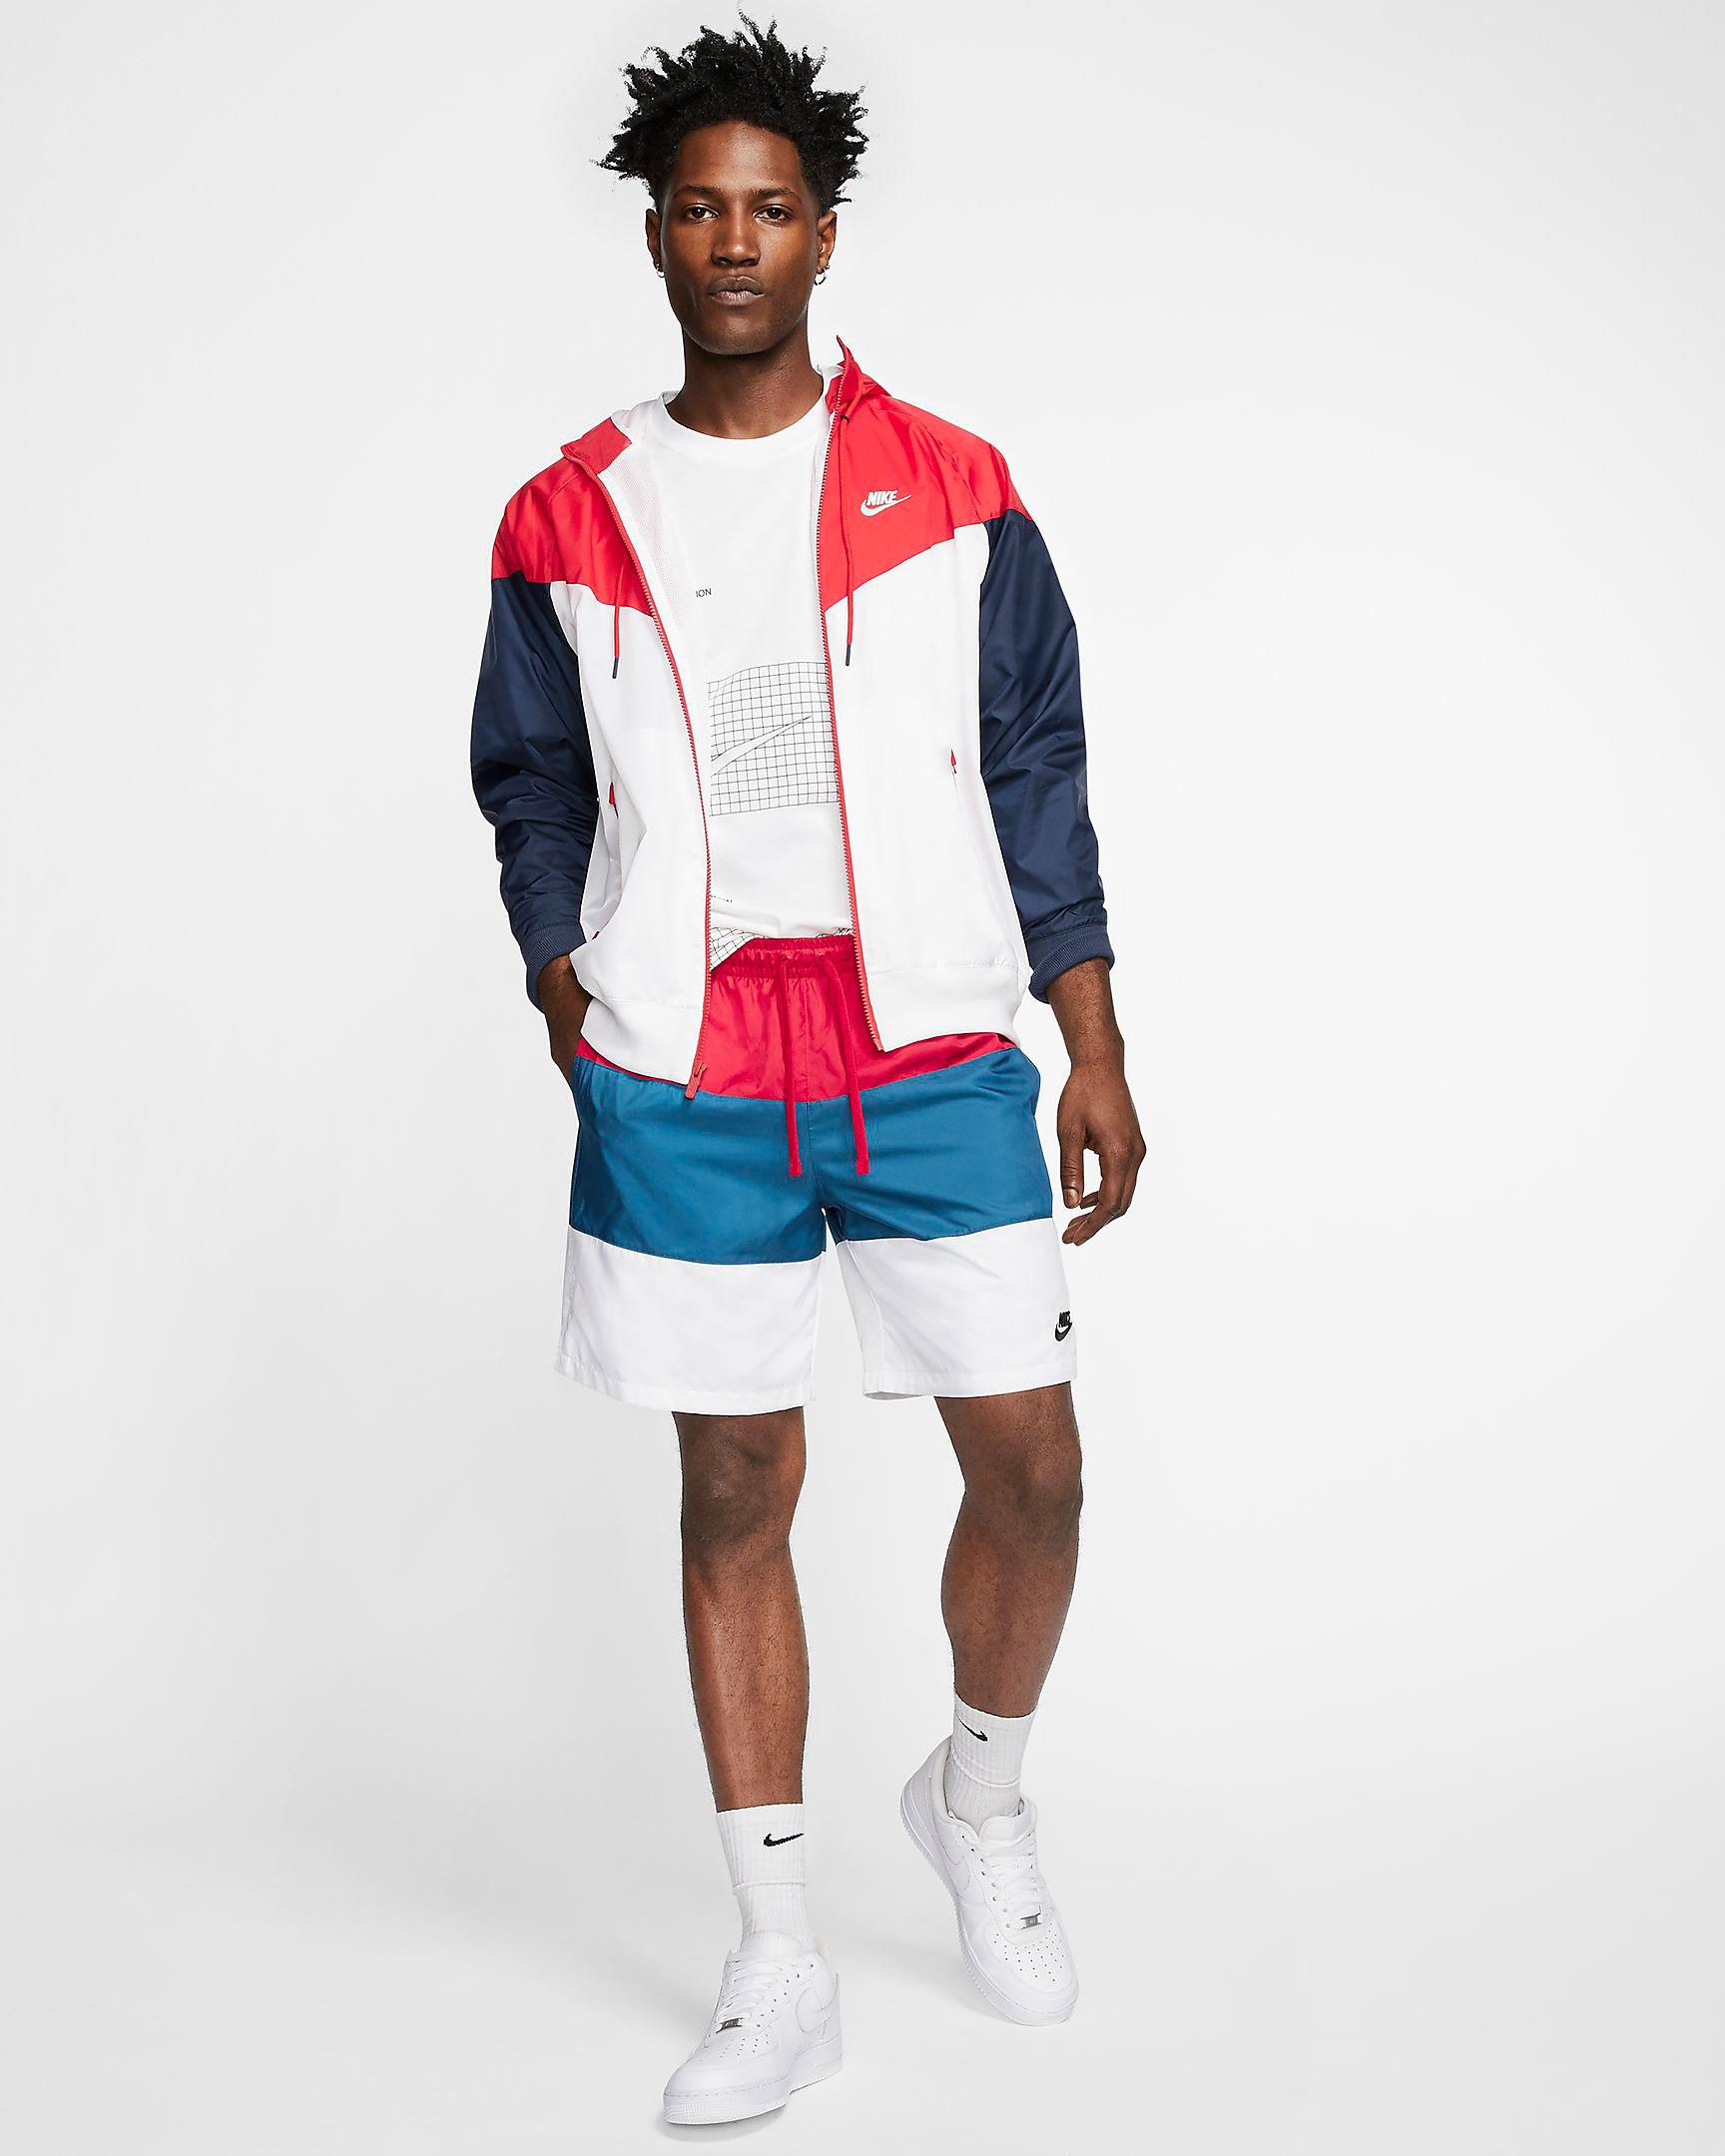 nike-sportswear-usa-americana-clothing